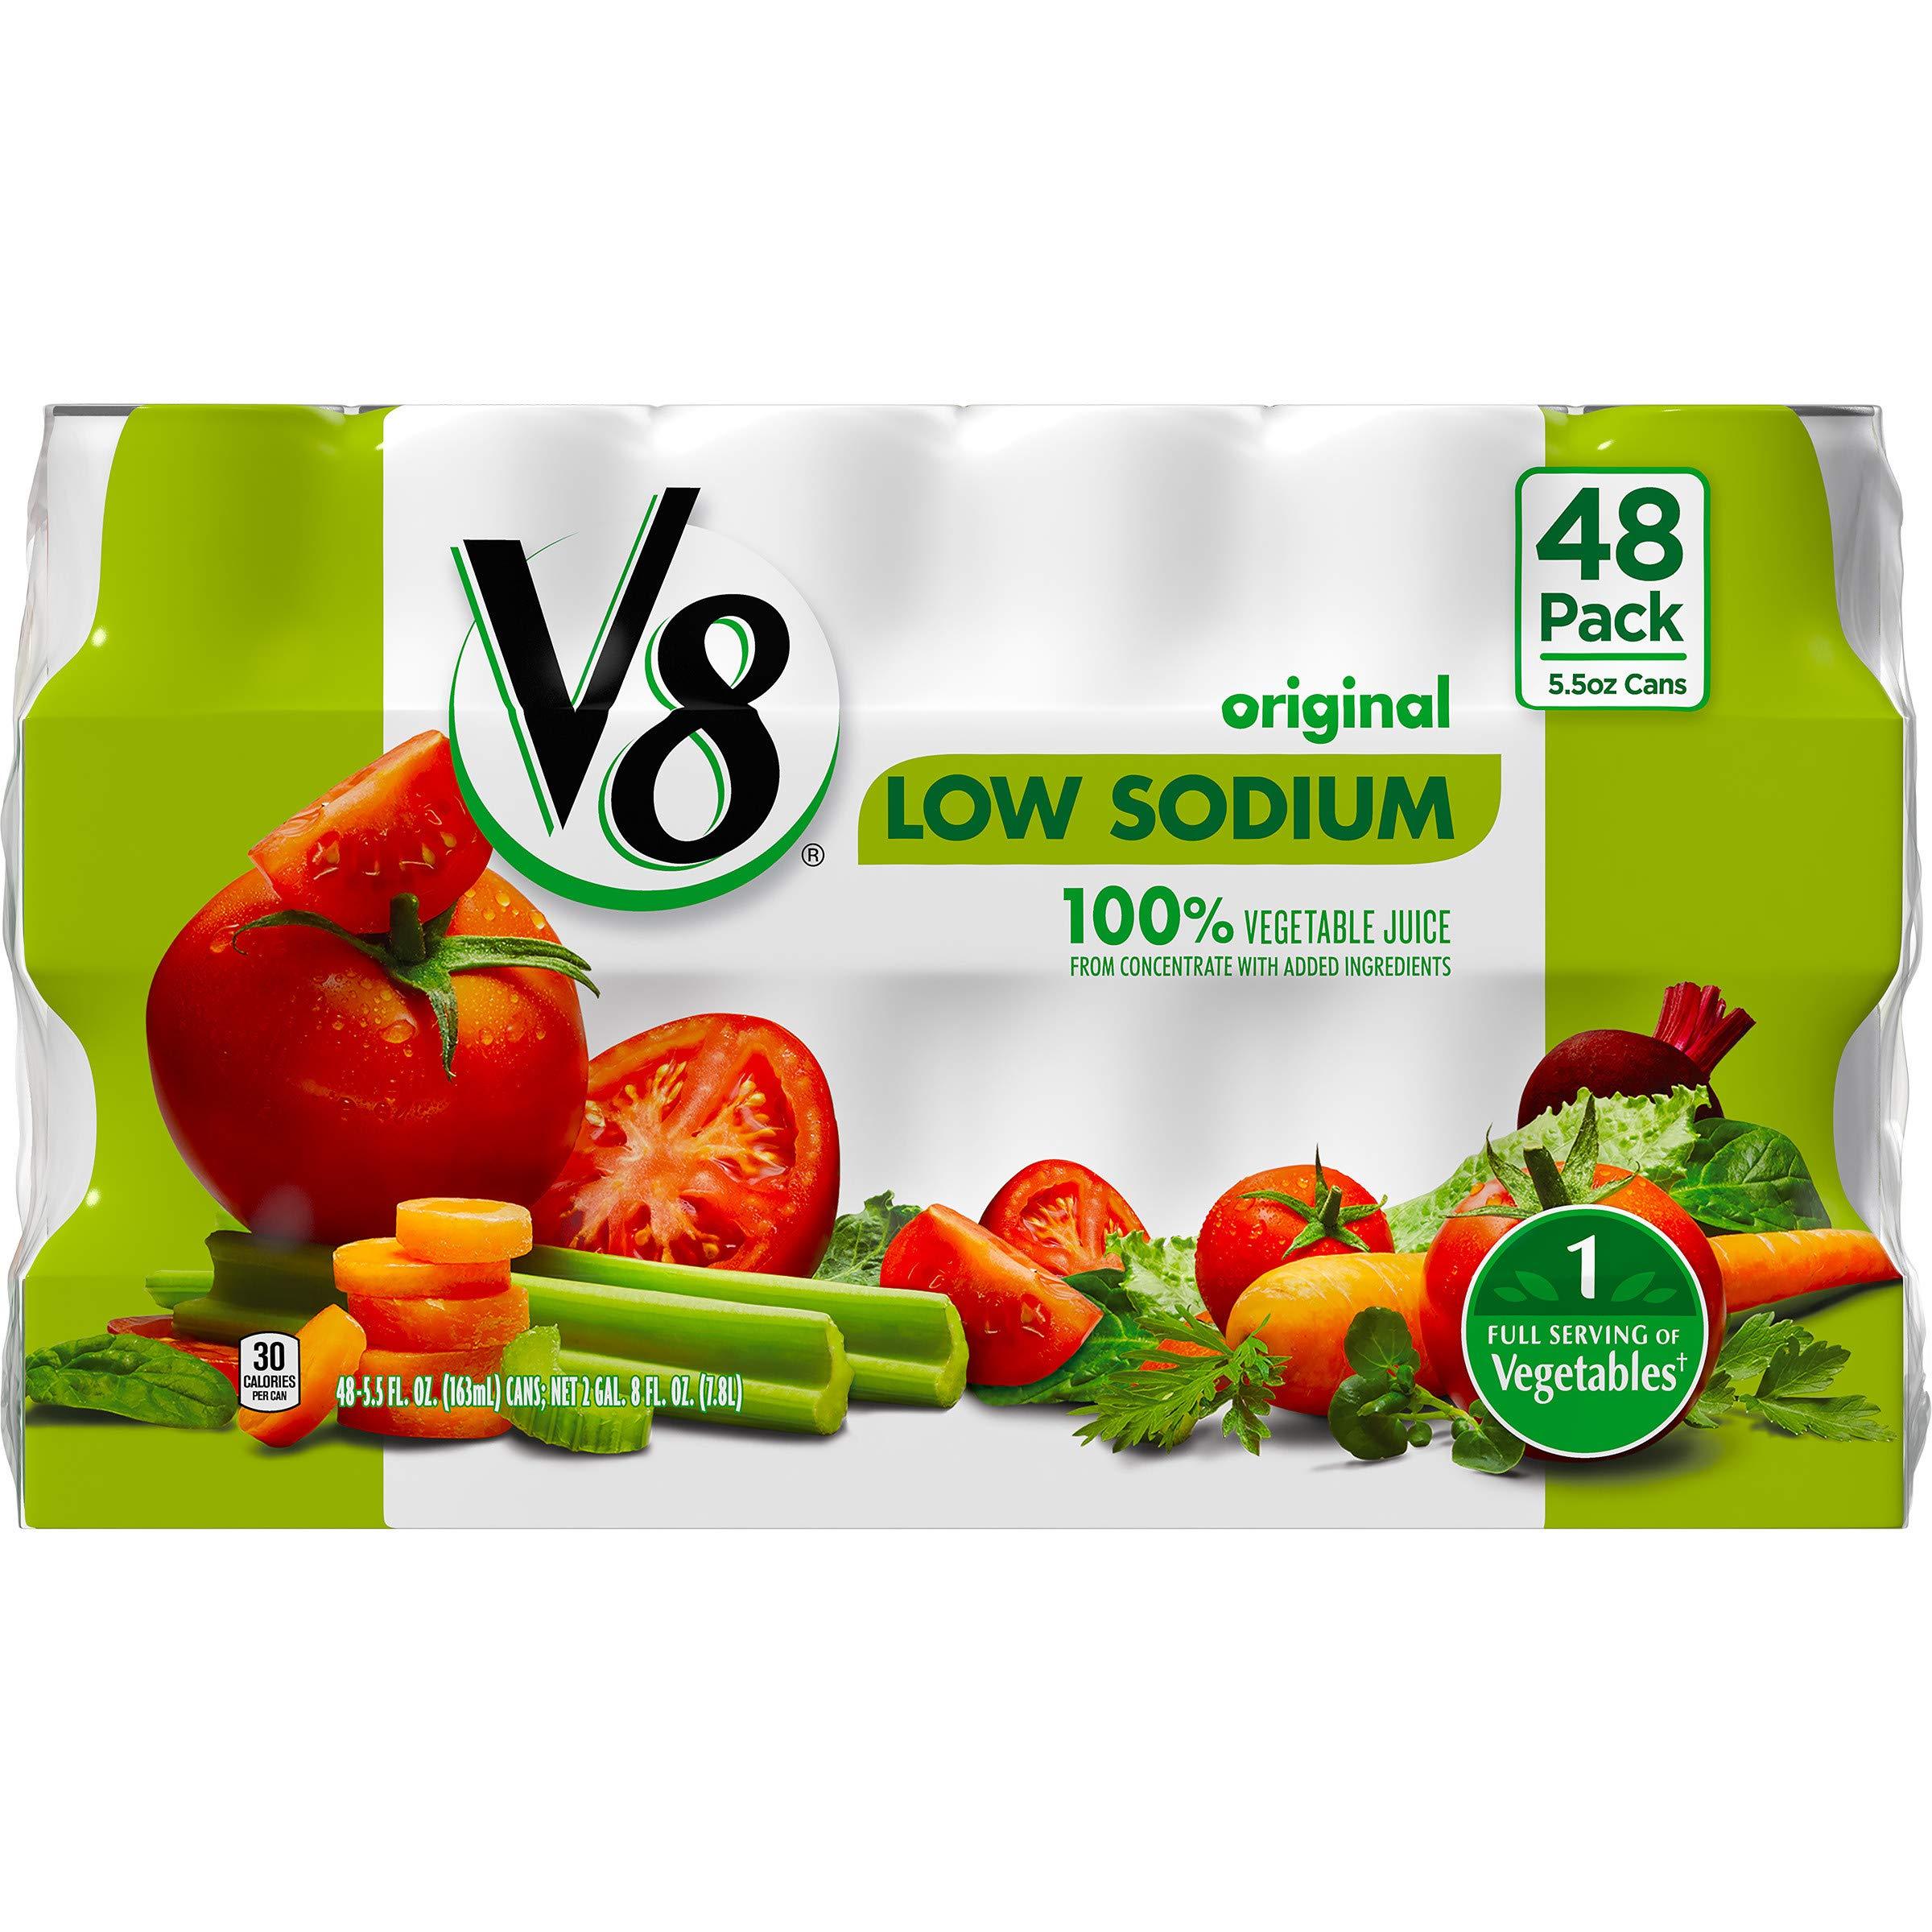 V8 Original Low Sodium 100% Vegetable Juice, 5.5 Ounce, 48 Count